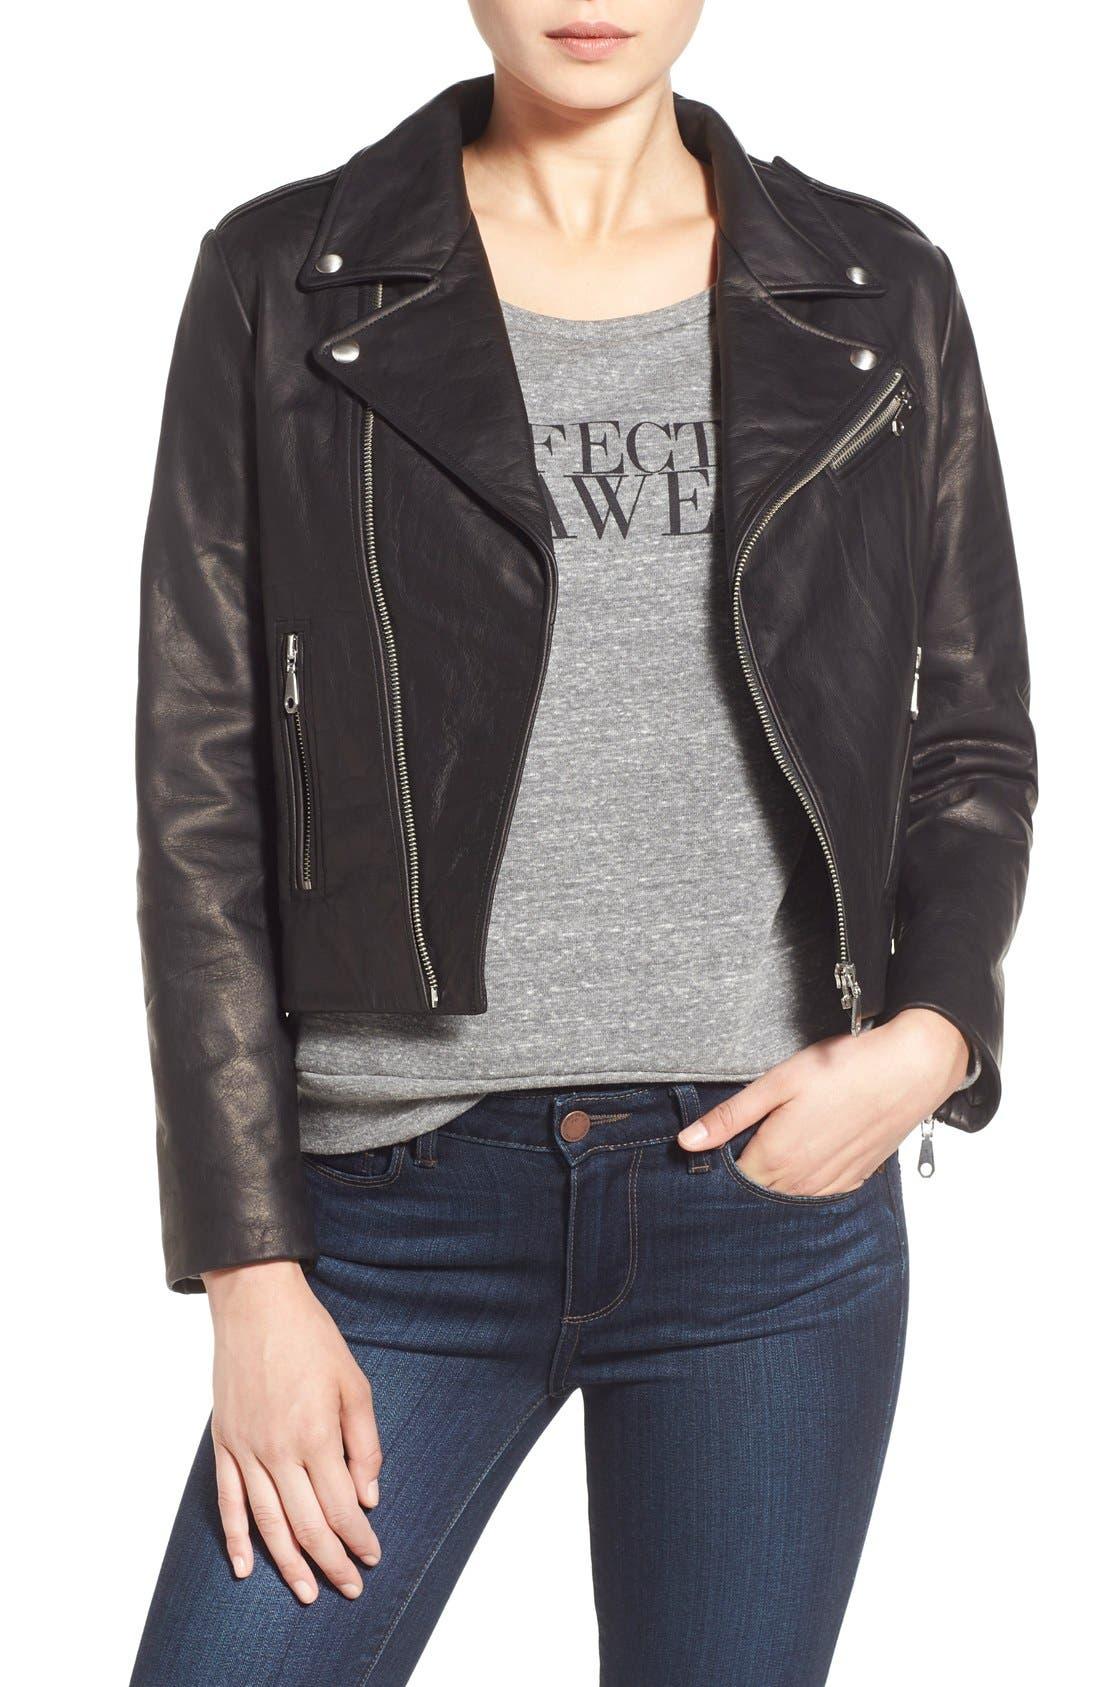 REBECCA MINKOFF, 'Nana' Leather Moto Jacket, Main thumbnail 1, color, 001